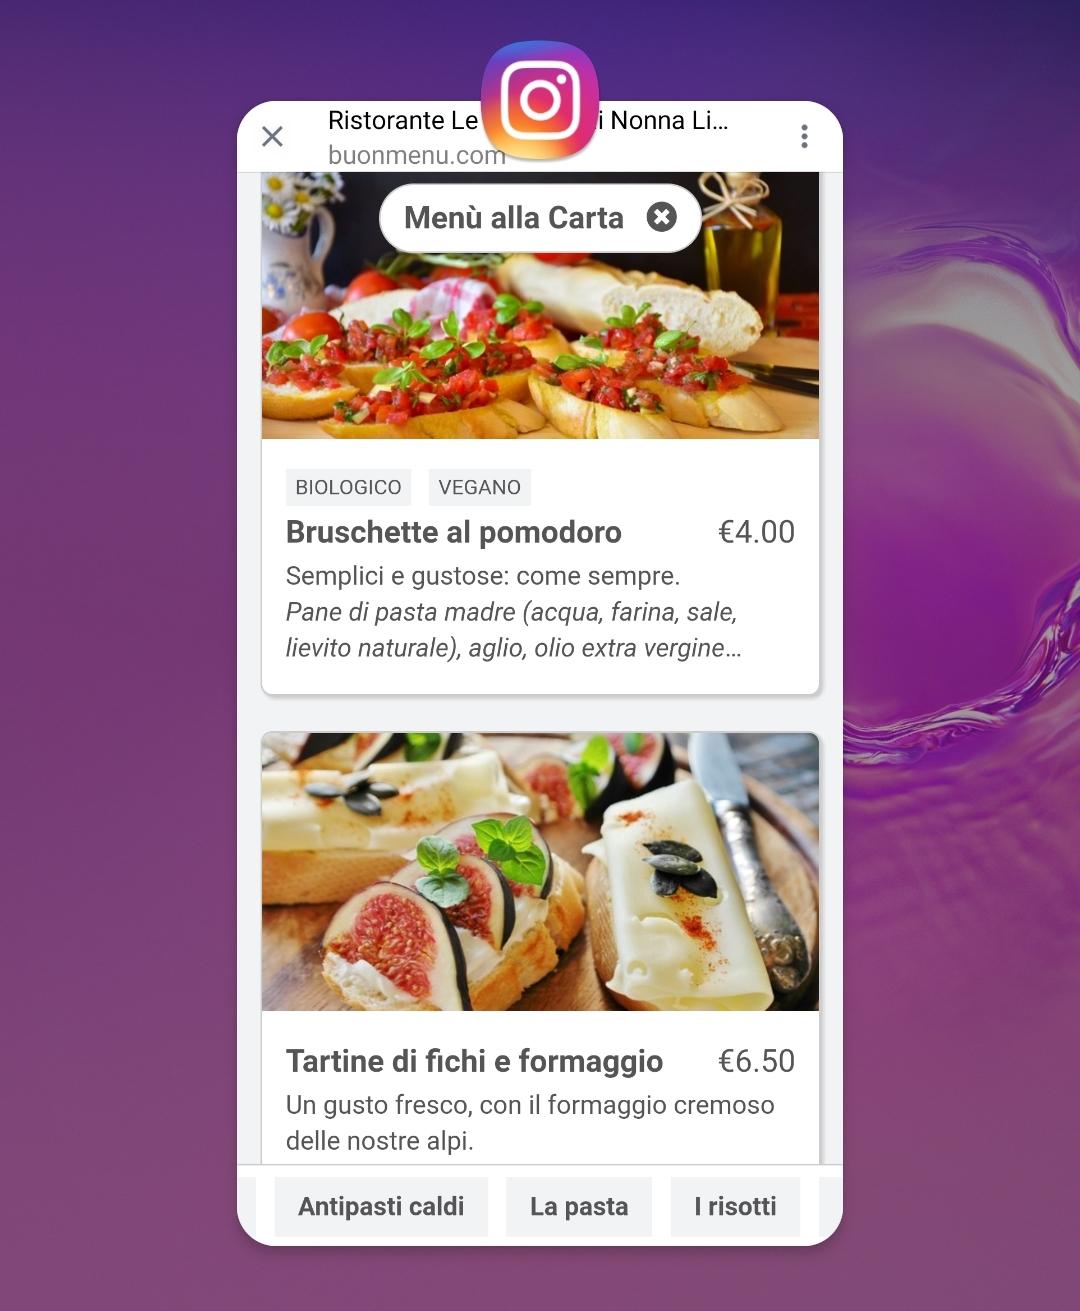 Restaurant menu on Instagram